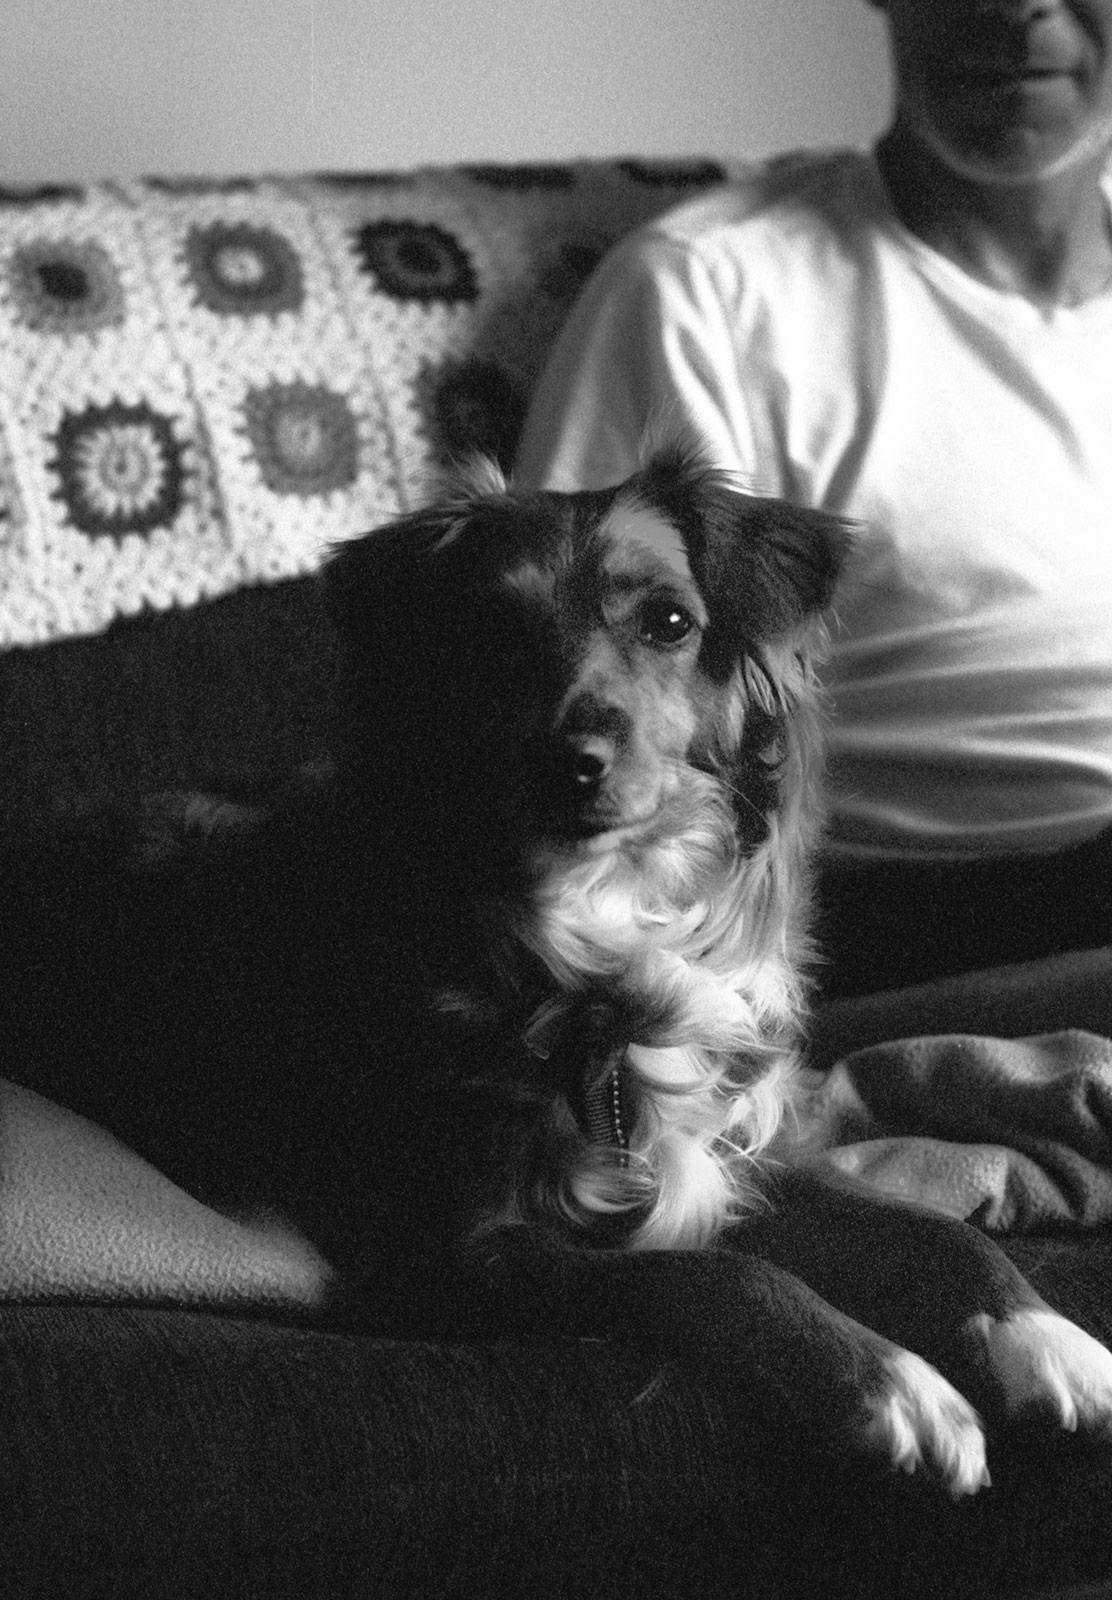 Dog sat on sofa